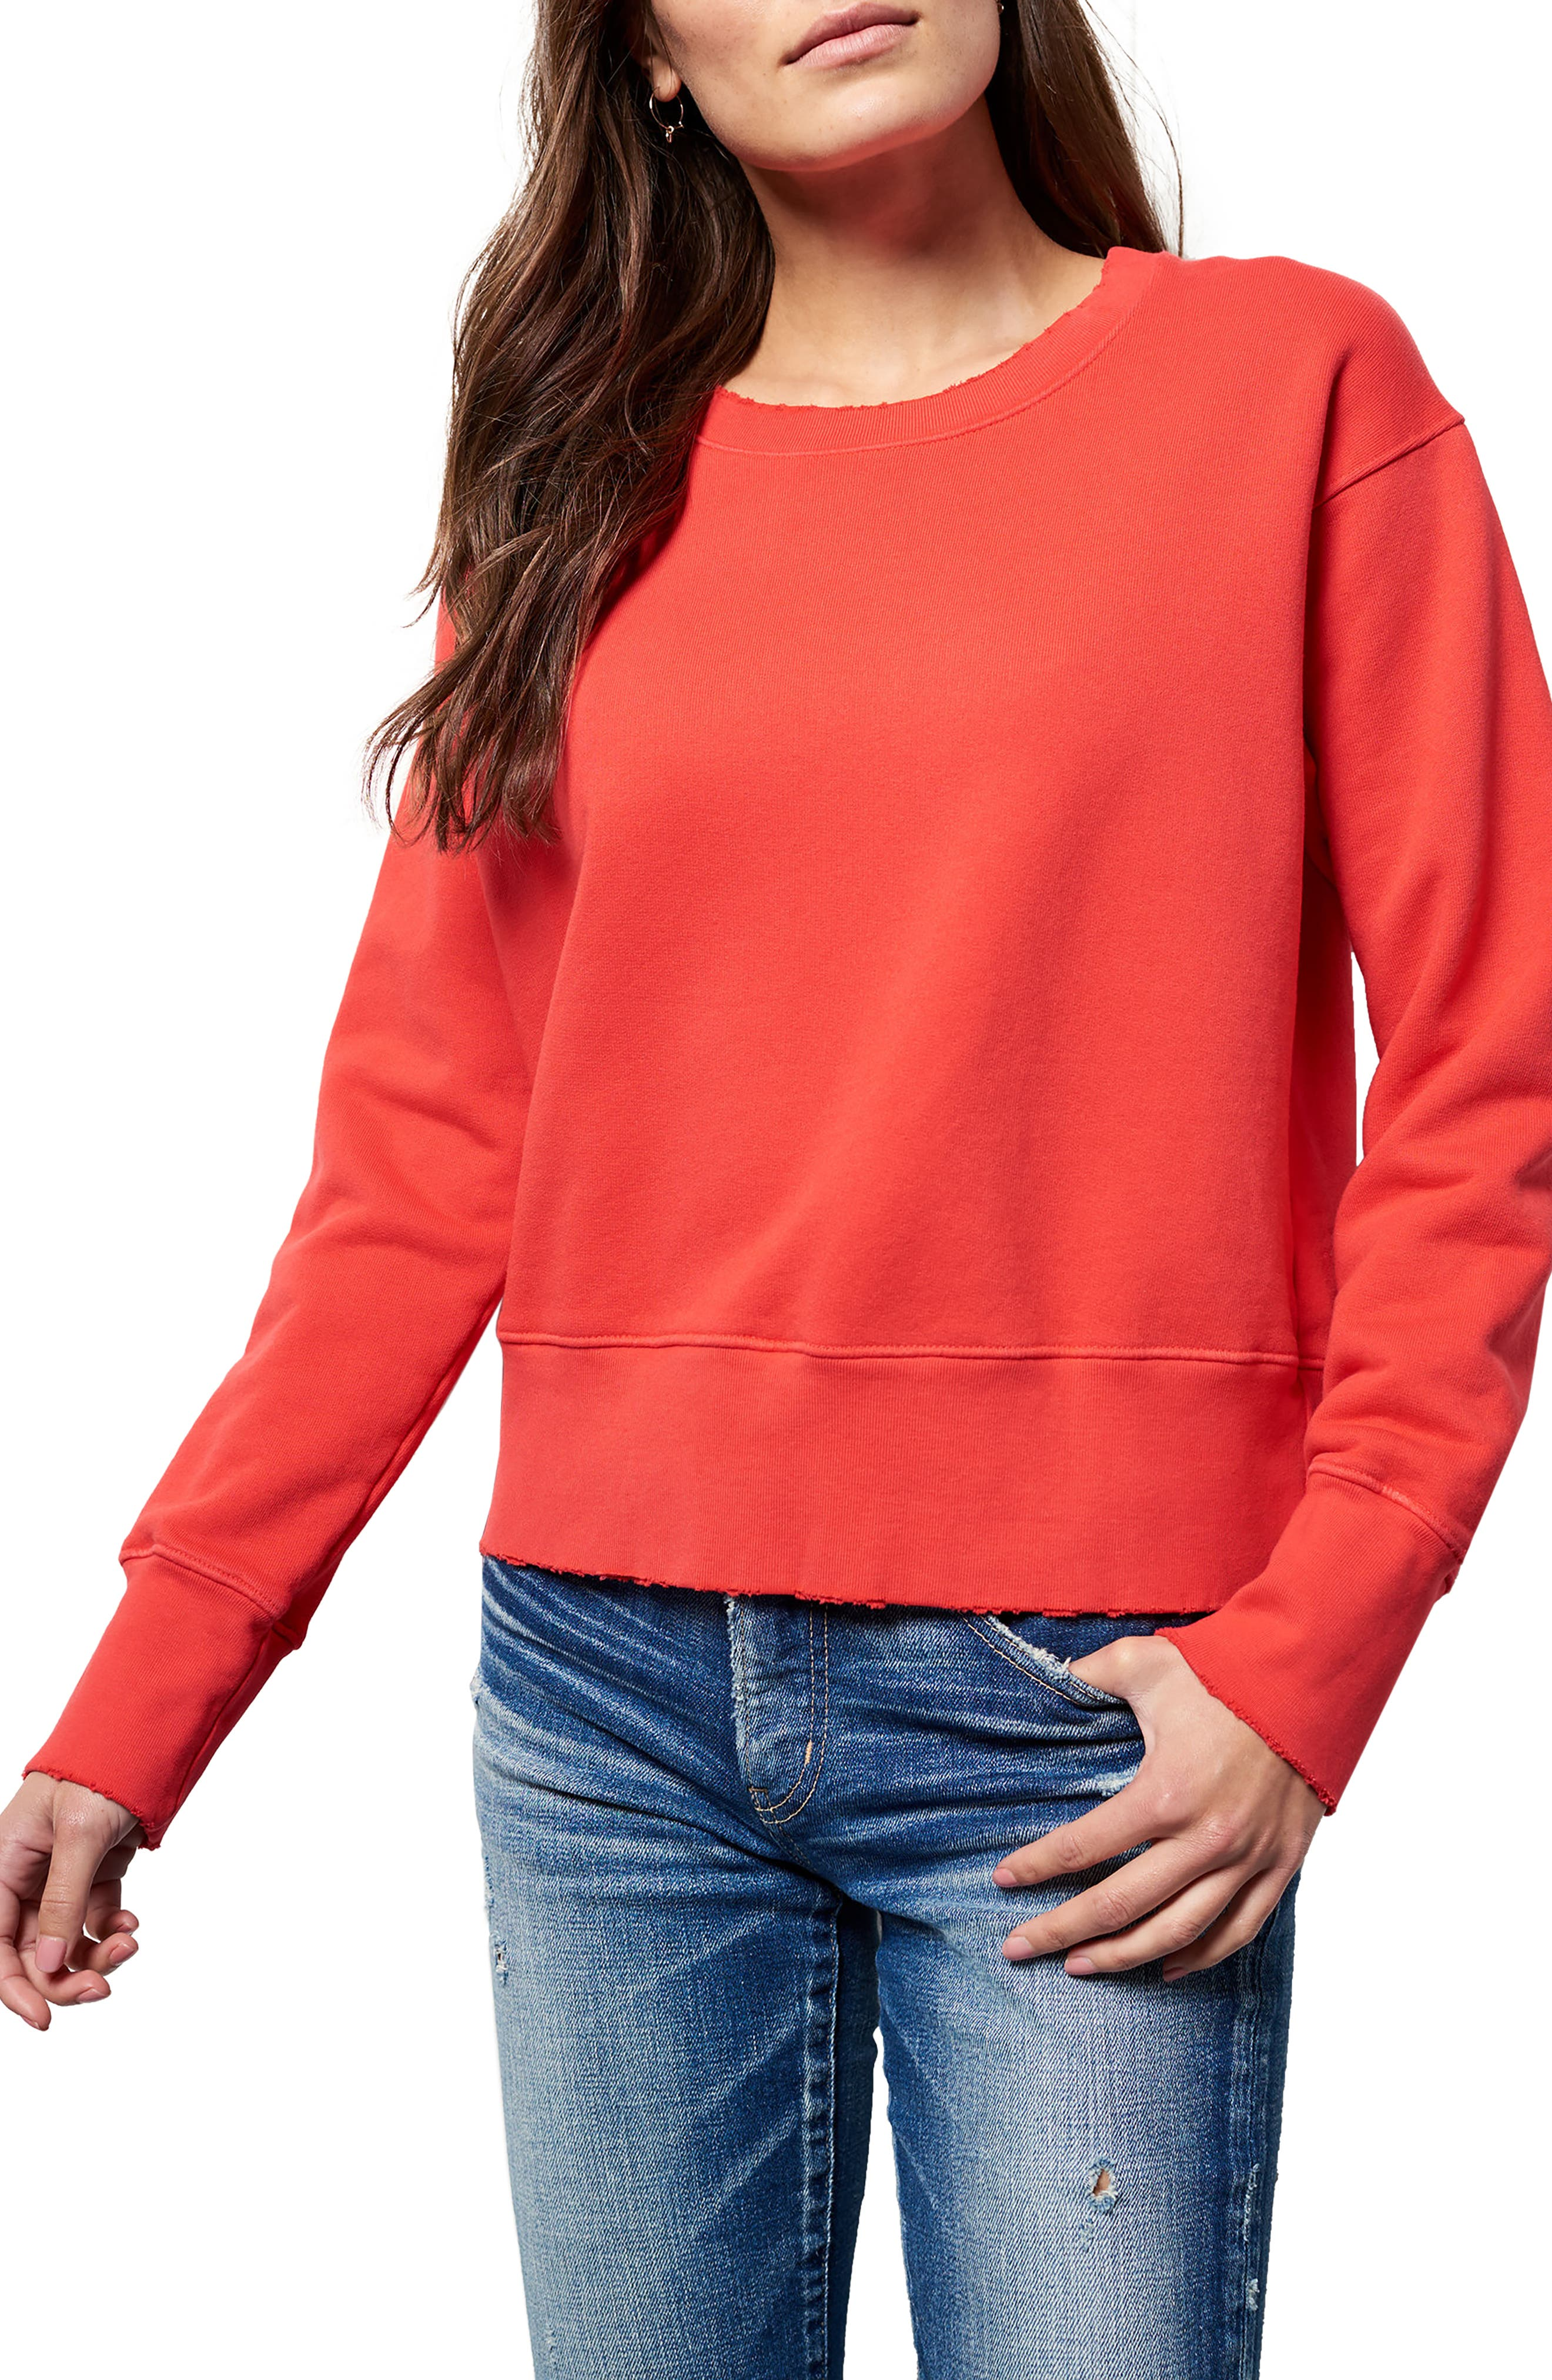 Frank & Eileen Tee Lab Distressed Sweatshirt